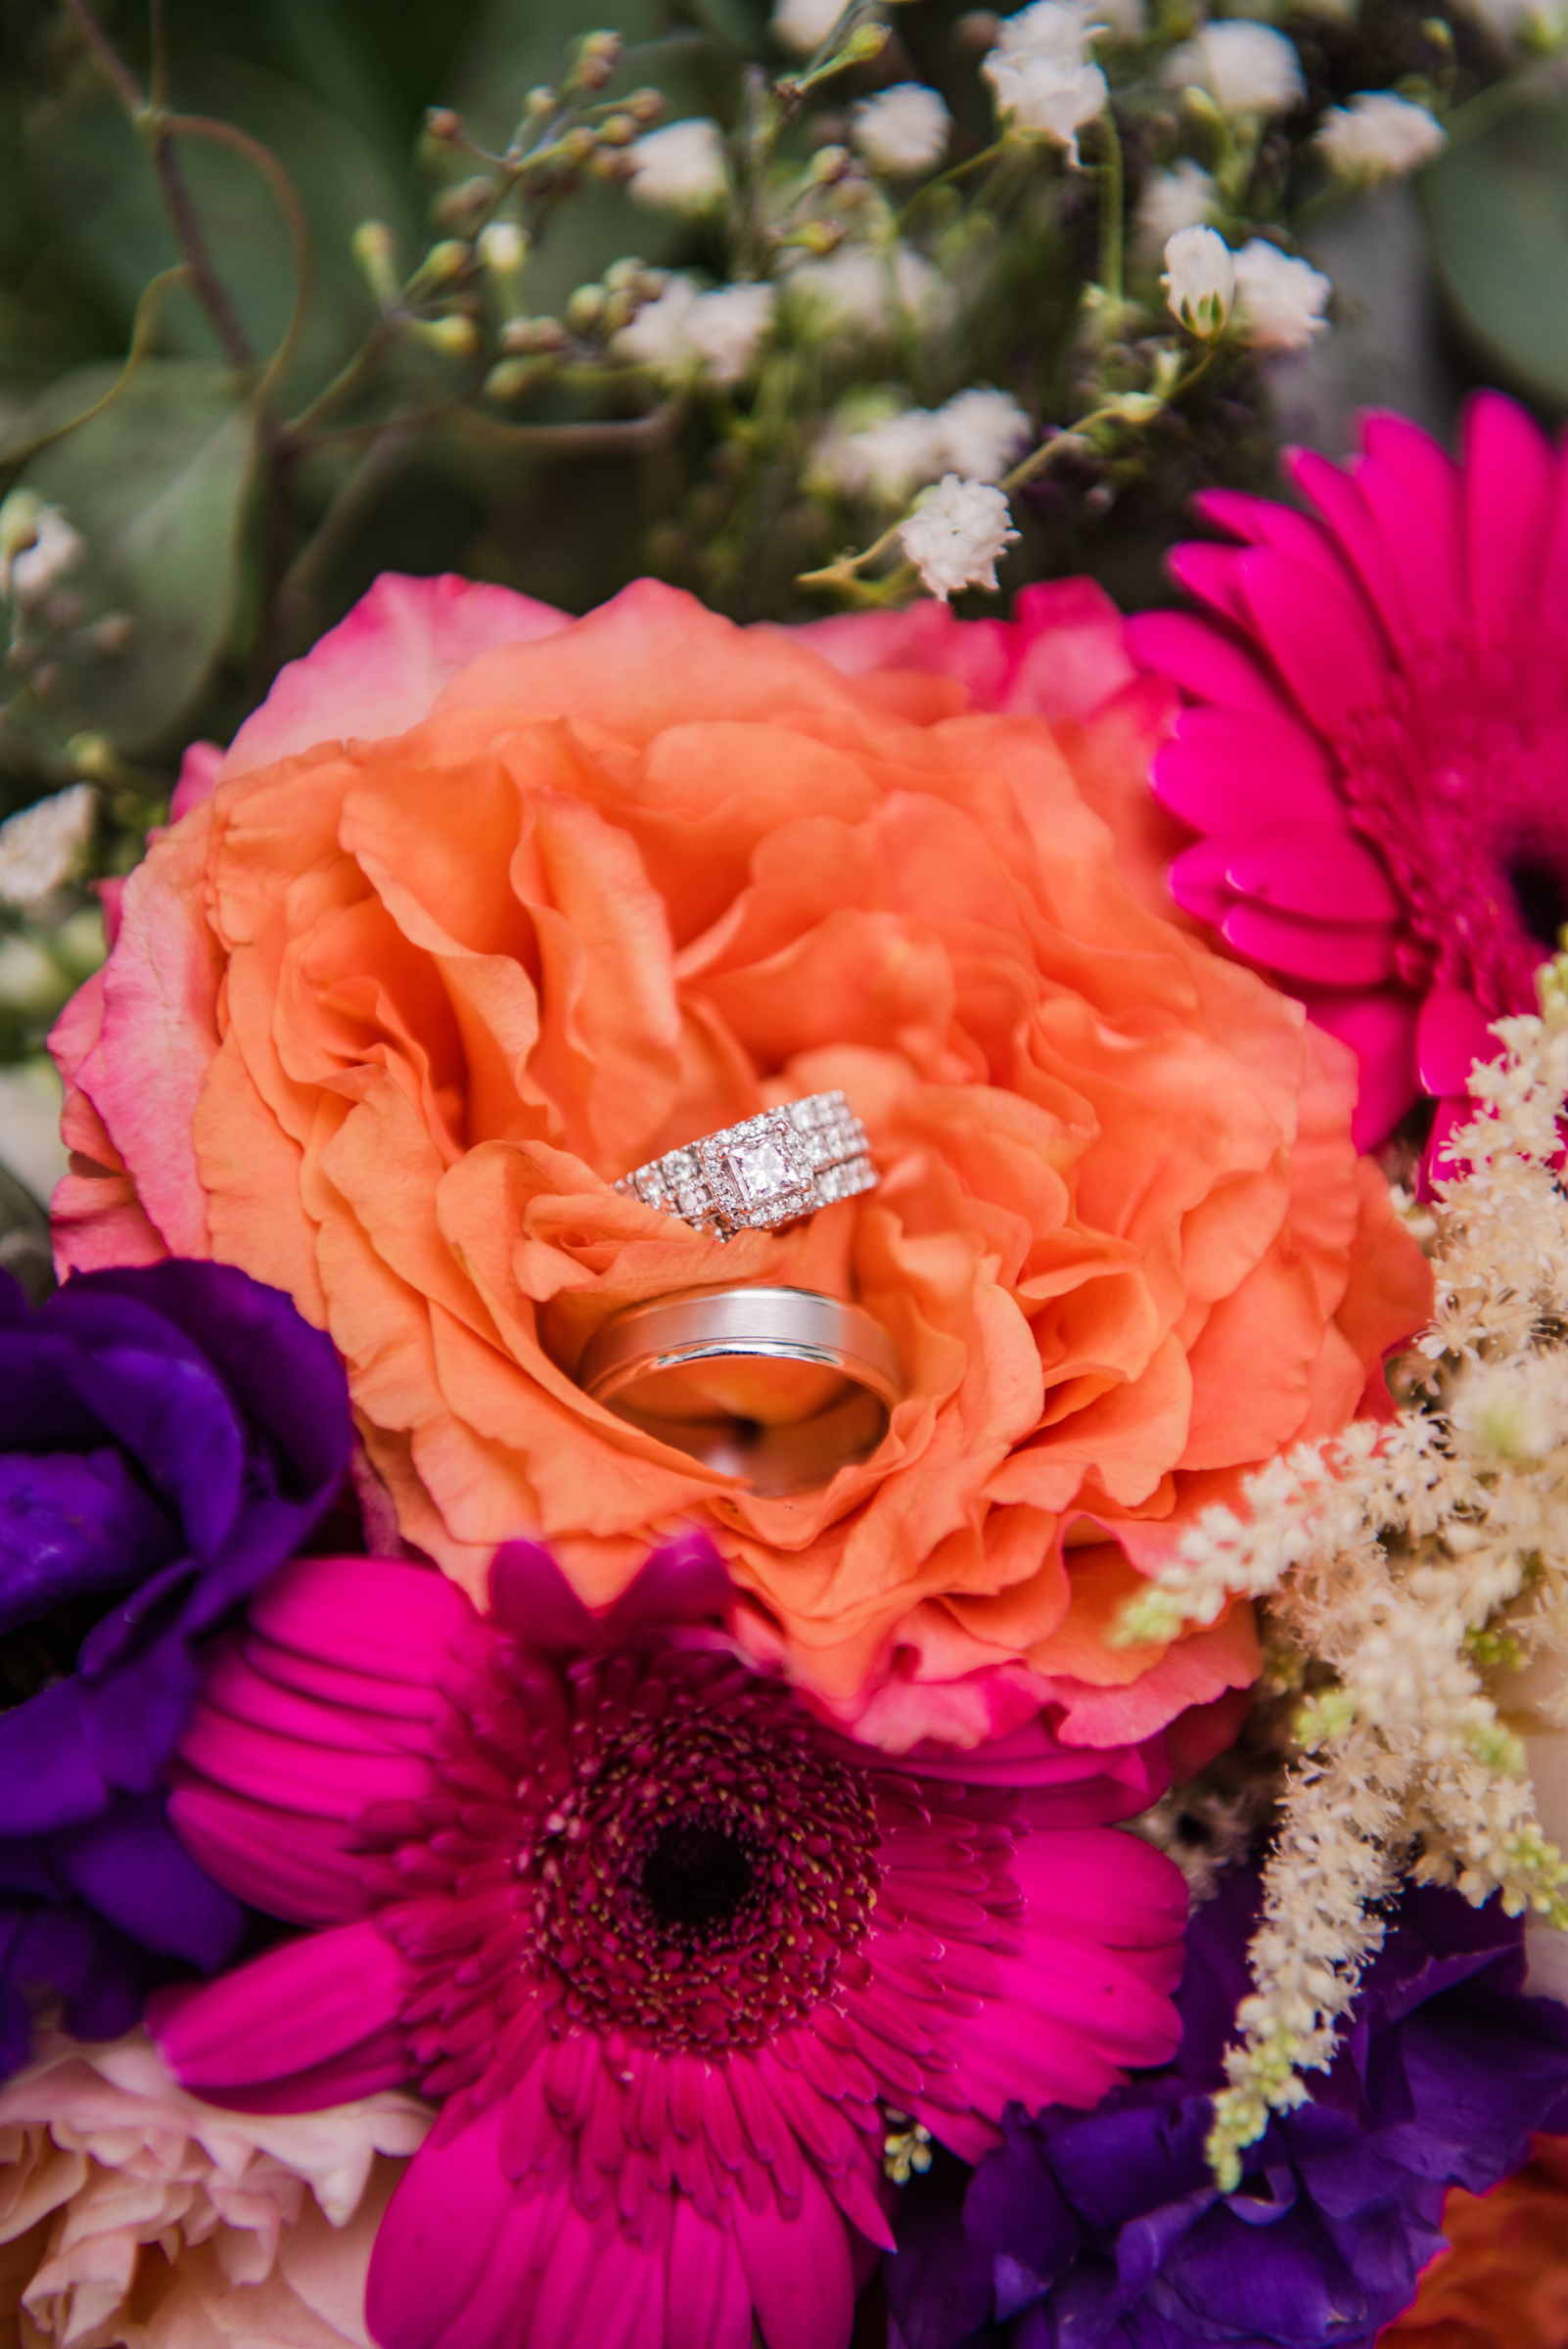 Wolf_Oak_Acres_Central_NY_Wedding_JILL_STUDIO_Rochester_NY_Photographer_DSC_8799.jpg